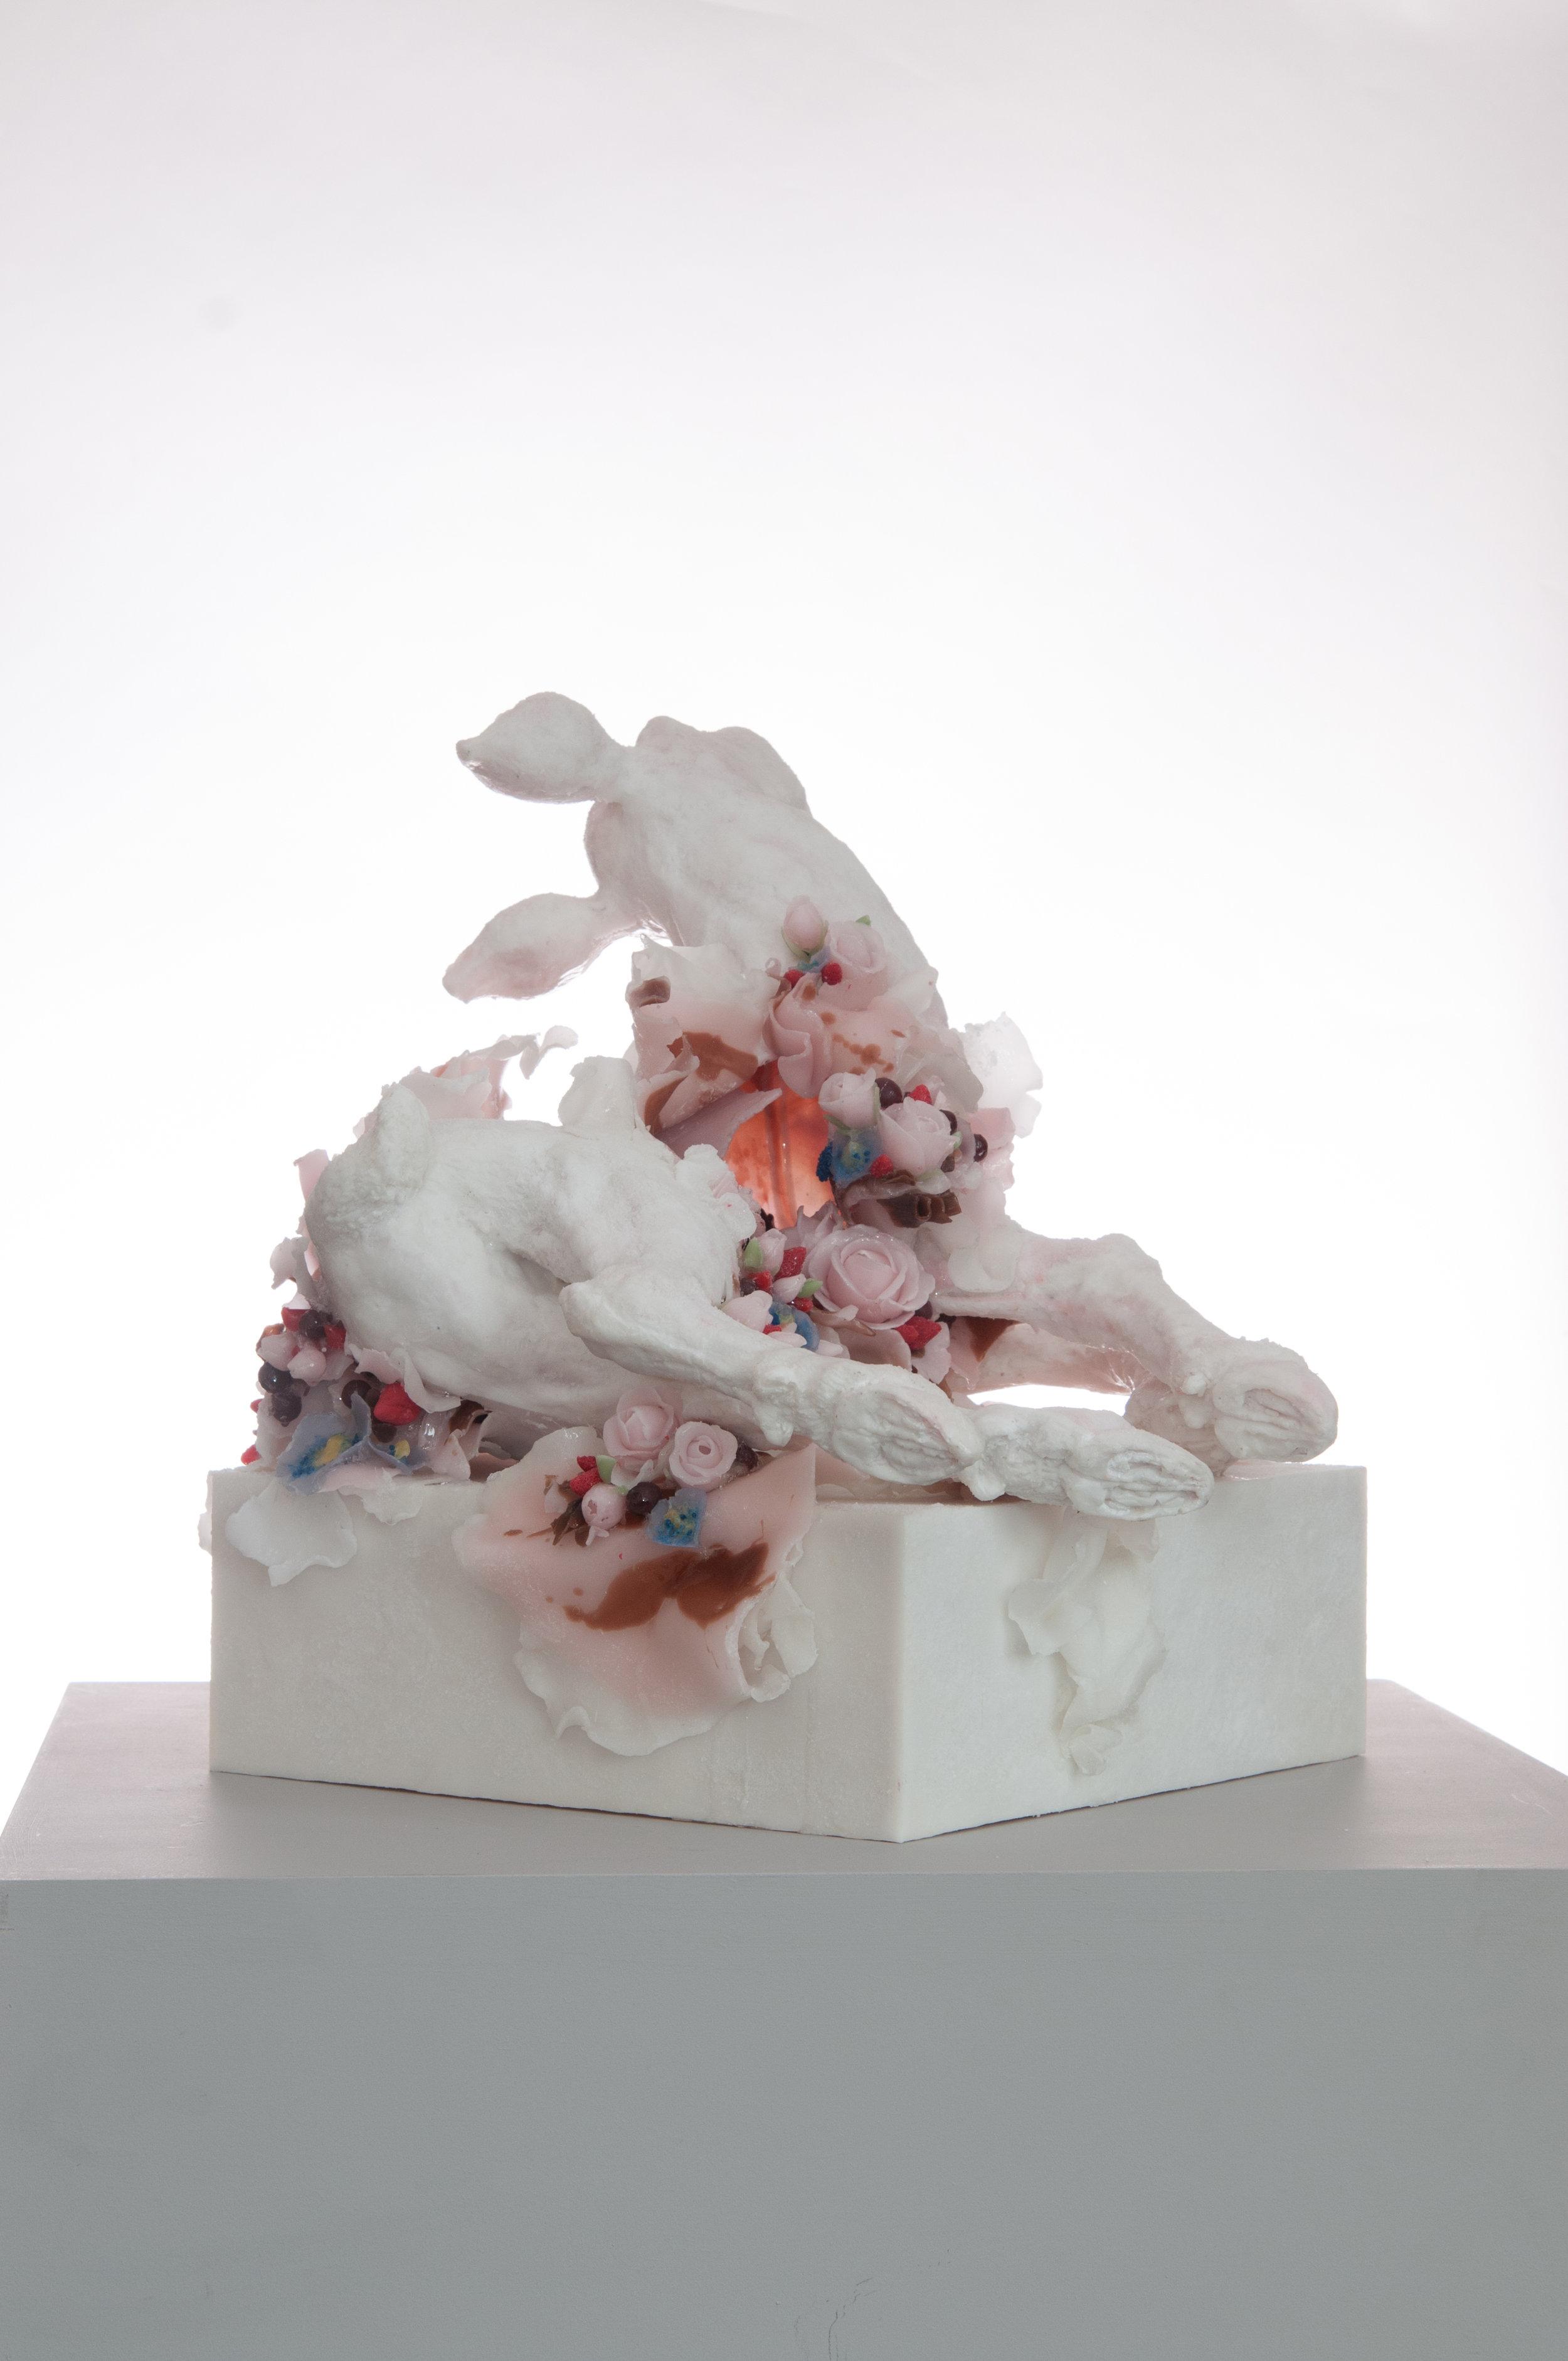 Rapture, 2018, Polyester resin, wax, 45 x 50 x 50cm, £9000